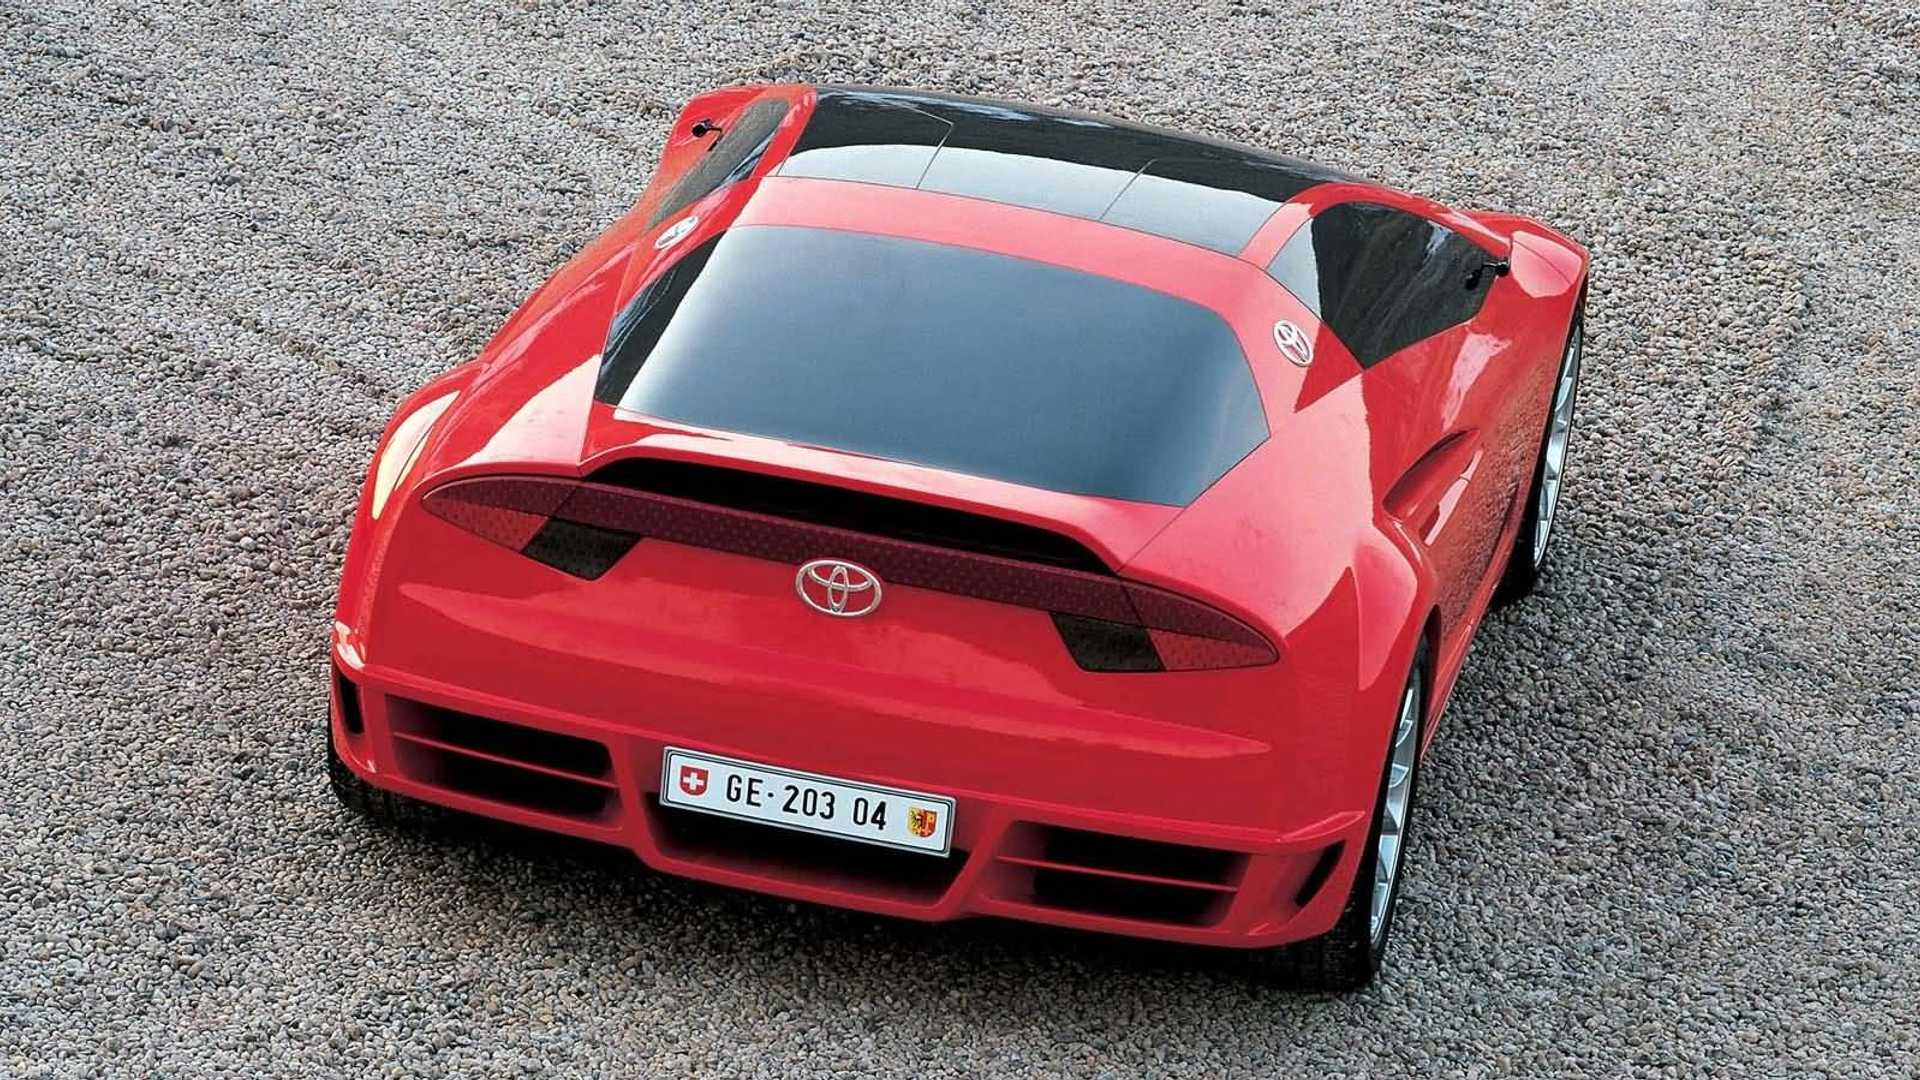 Toyota-Alessandro-Volta-concept-2004-13